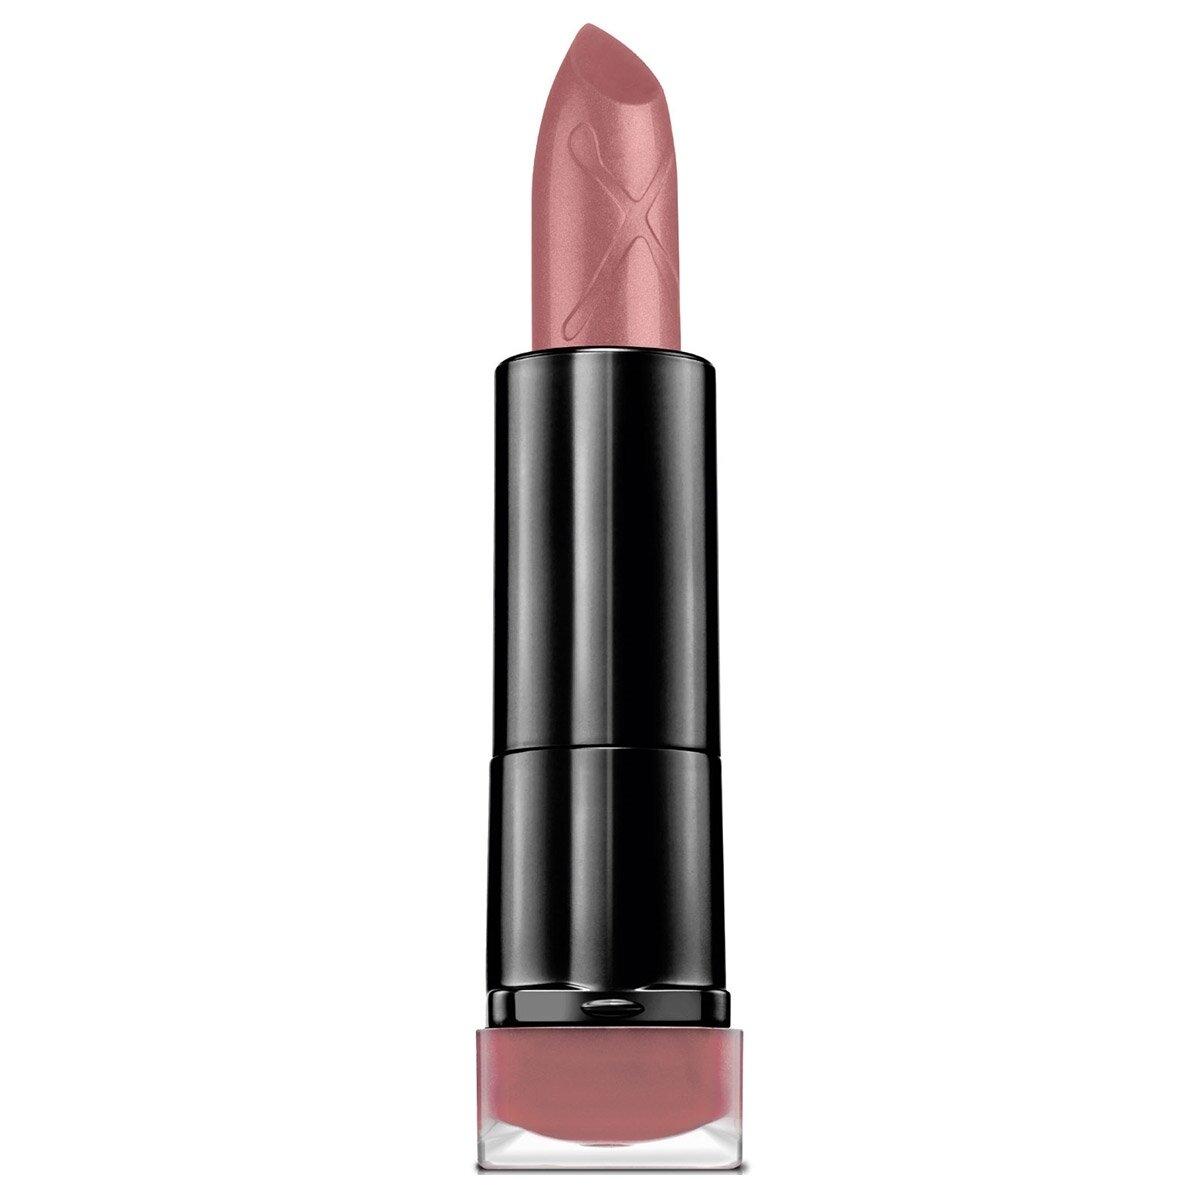 Color Elixir Matte Lipstick Ruj No. 05